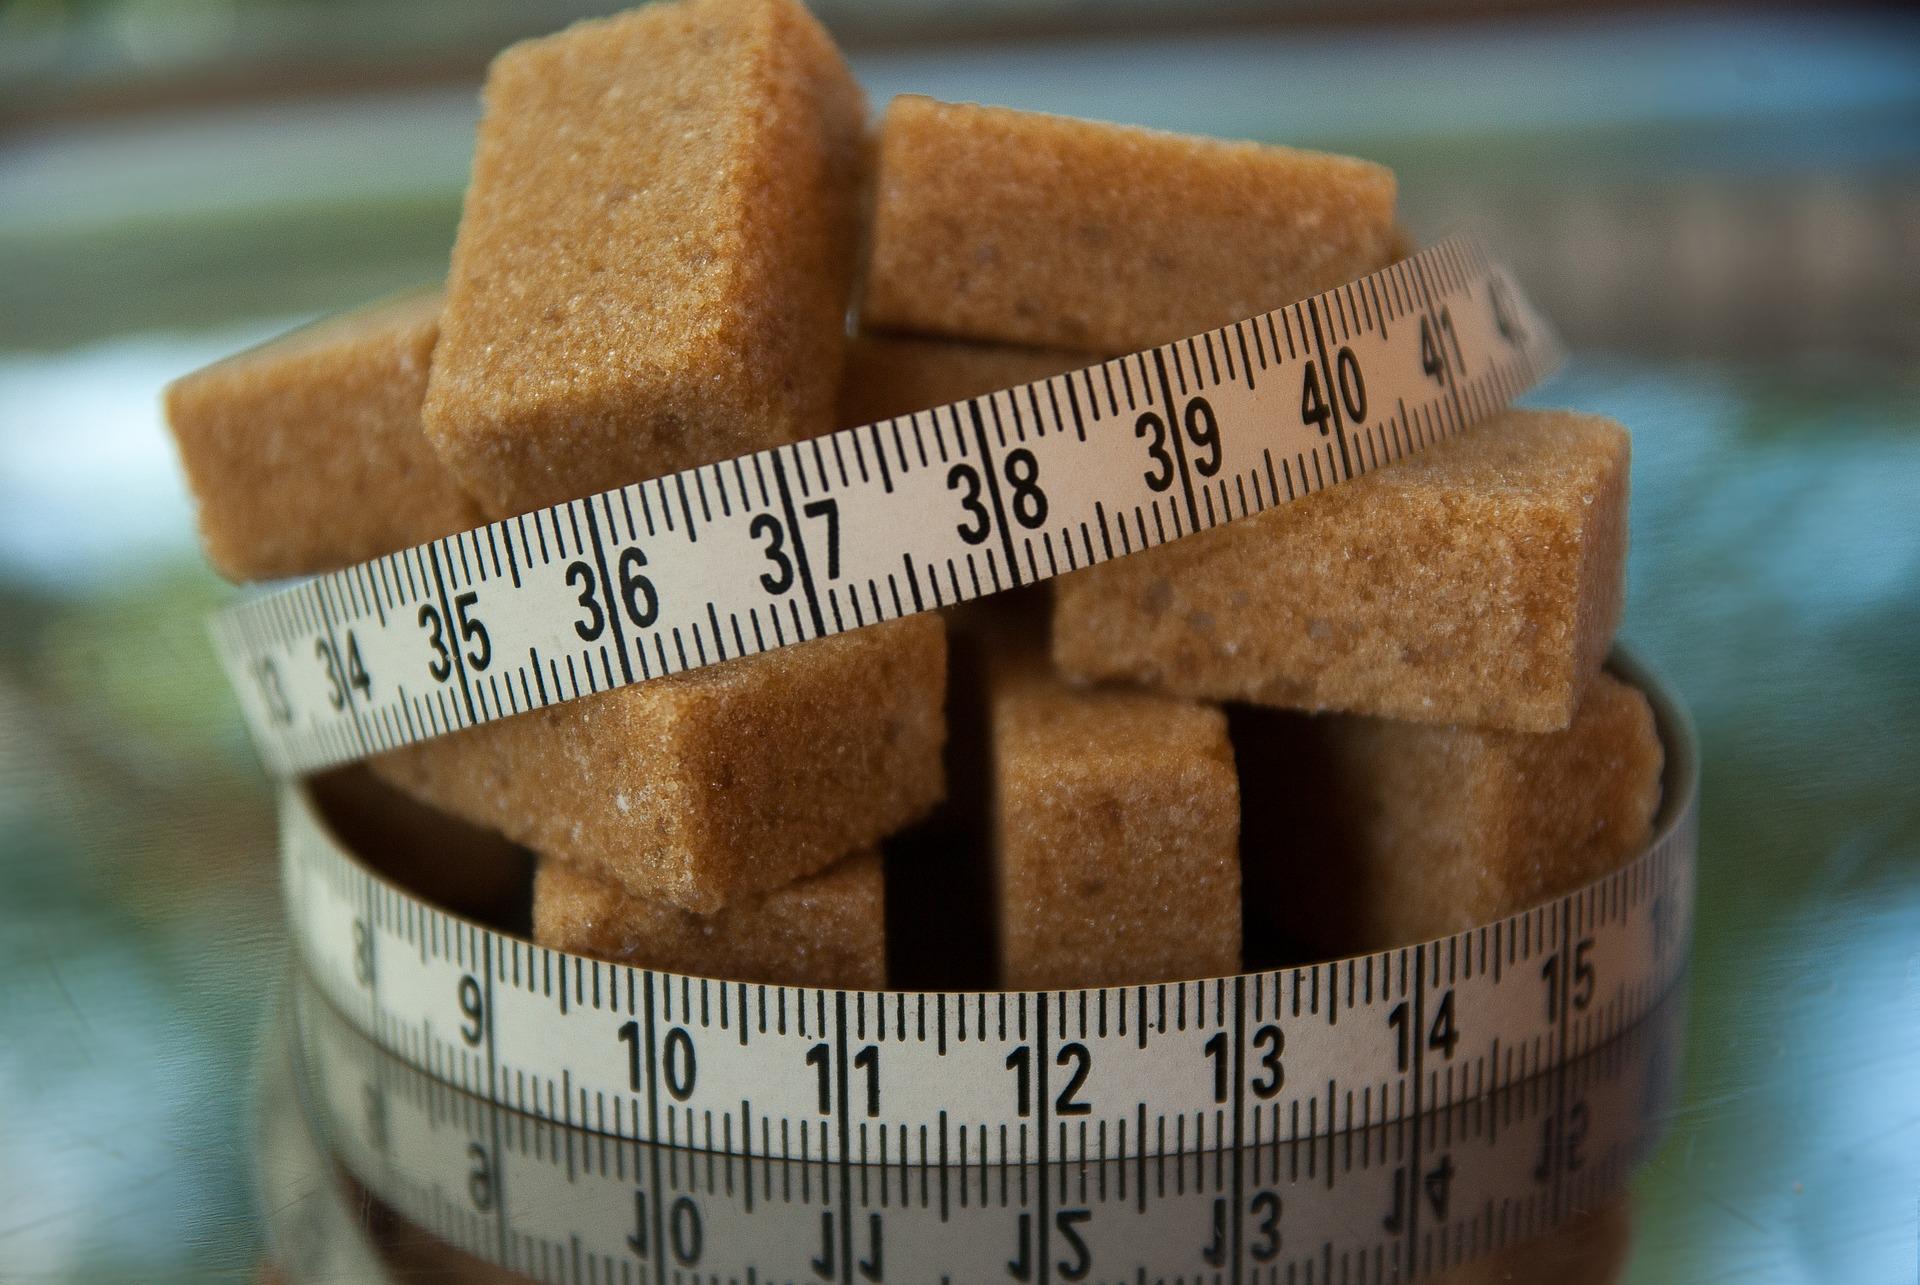 Sugar health risks